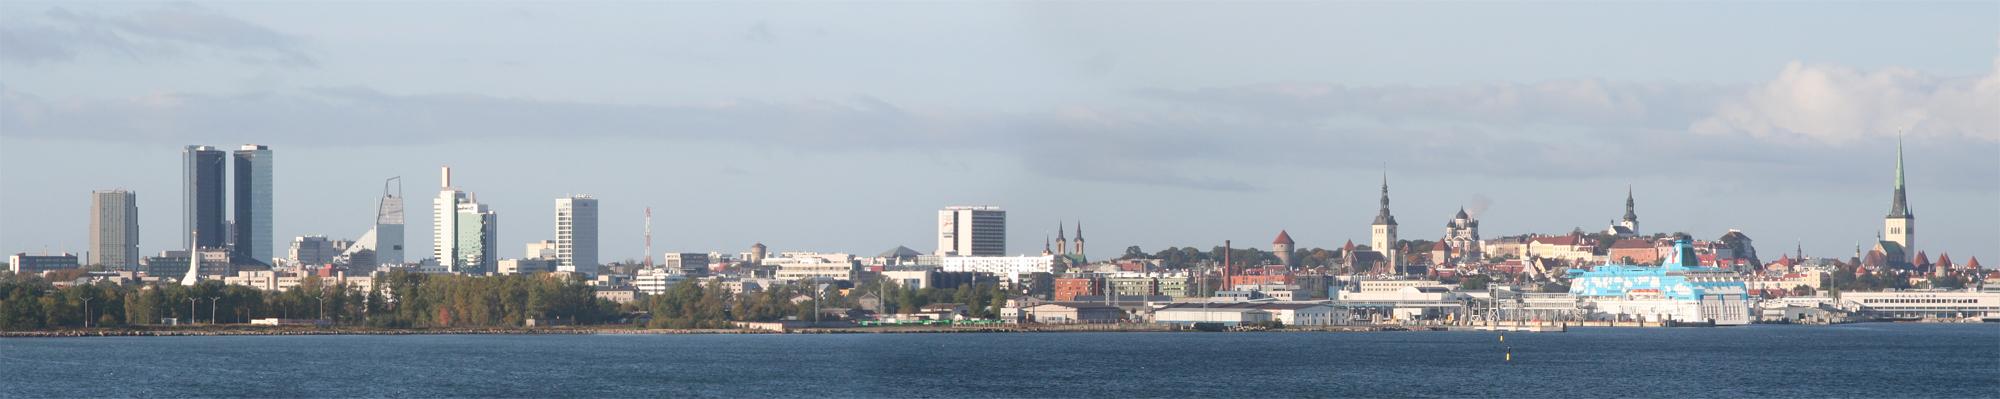 Tallinn, capitale de l'Estonie